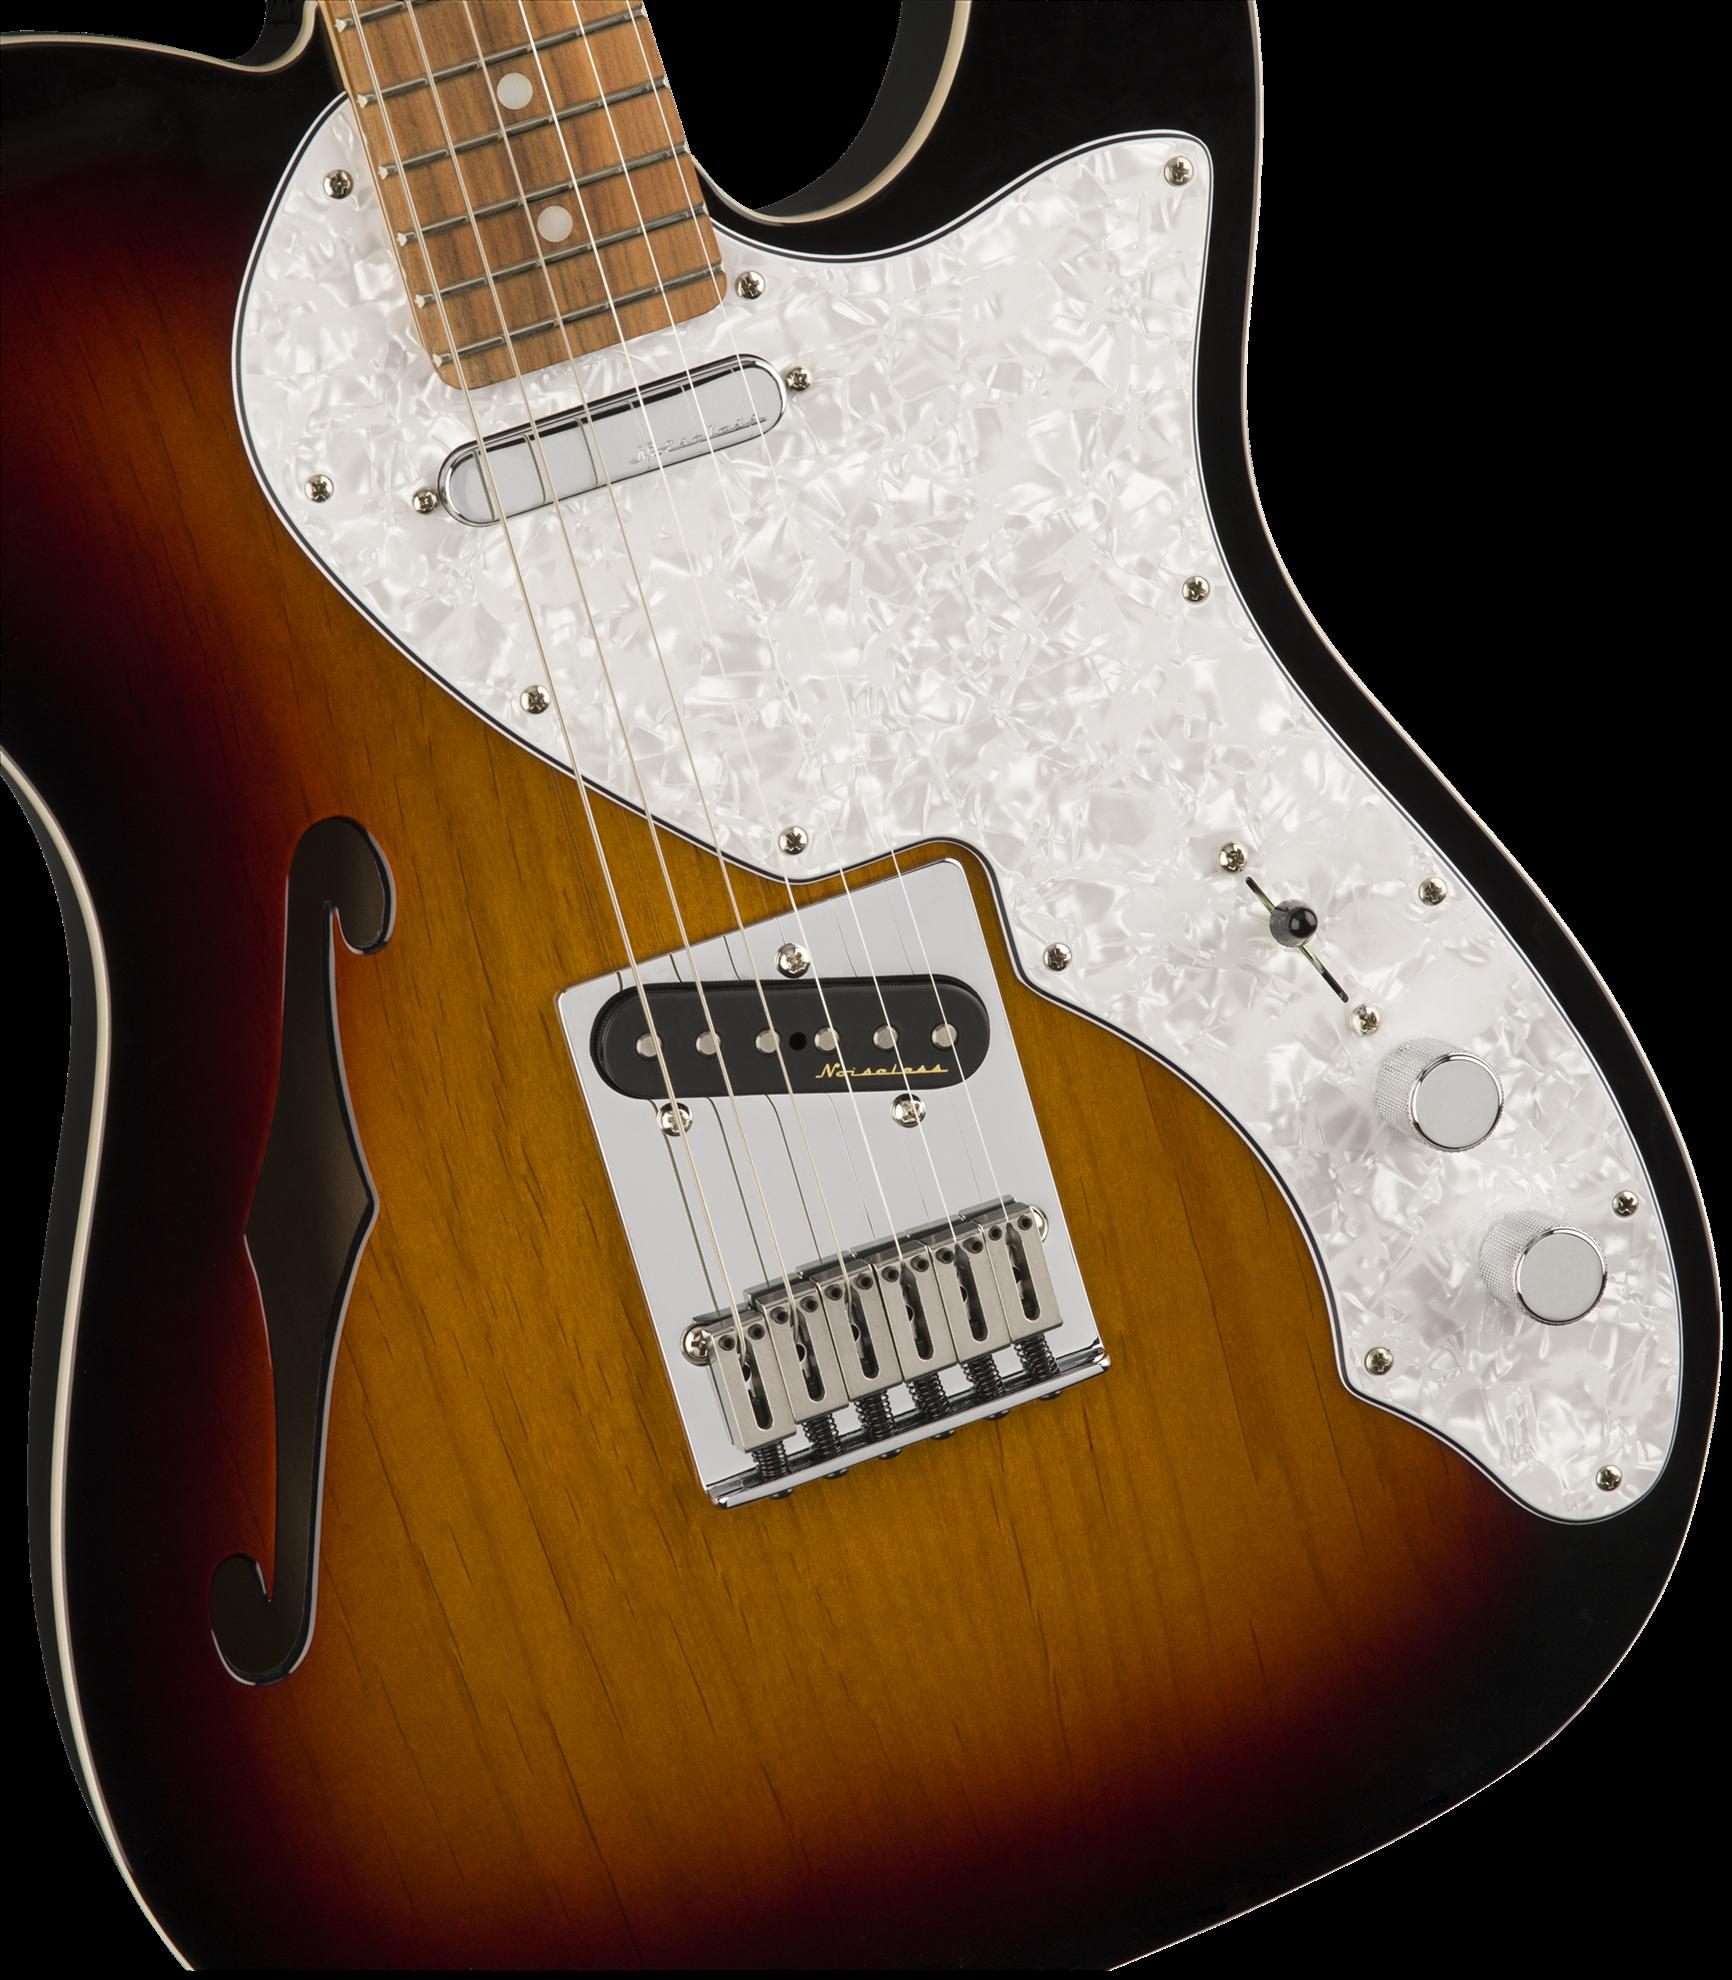 Fender Deluxe Telecaster Thinline Electric Guitar - Pau Ferro Fretboard -3 Colour Sunburst